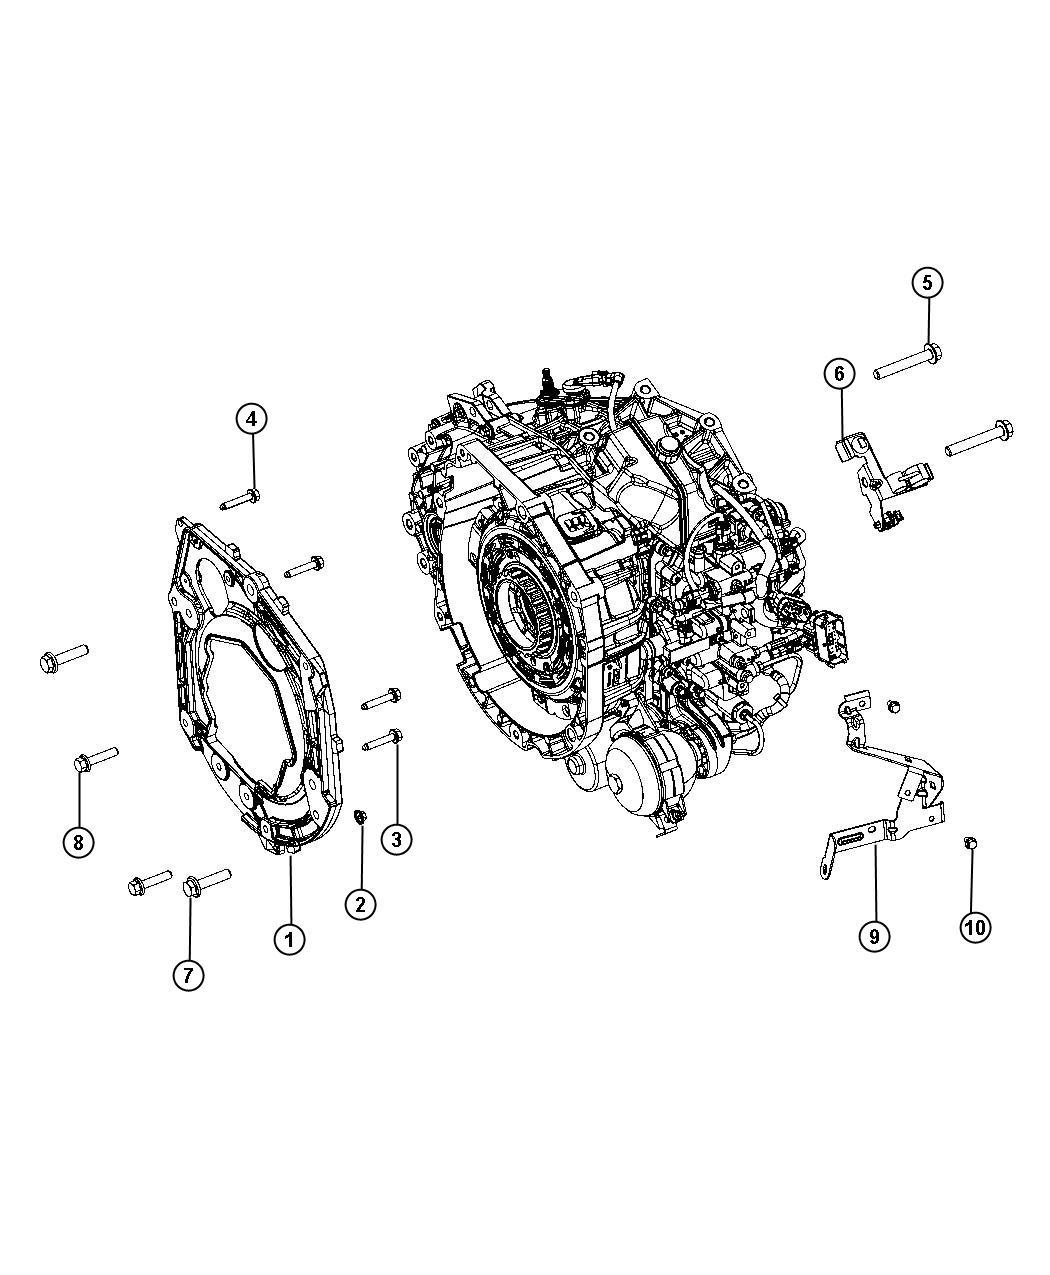 Dodge Dart Nut Hex M12x1 25 Engine Mounting